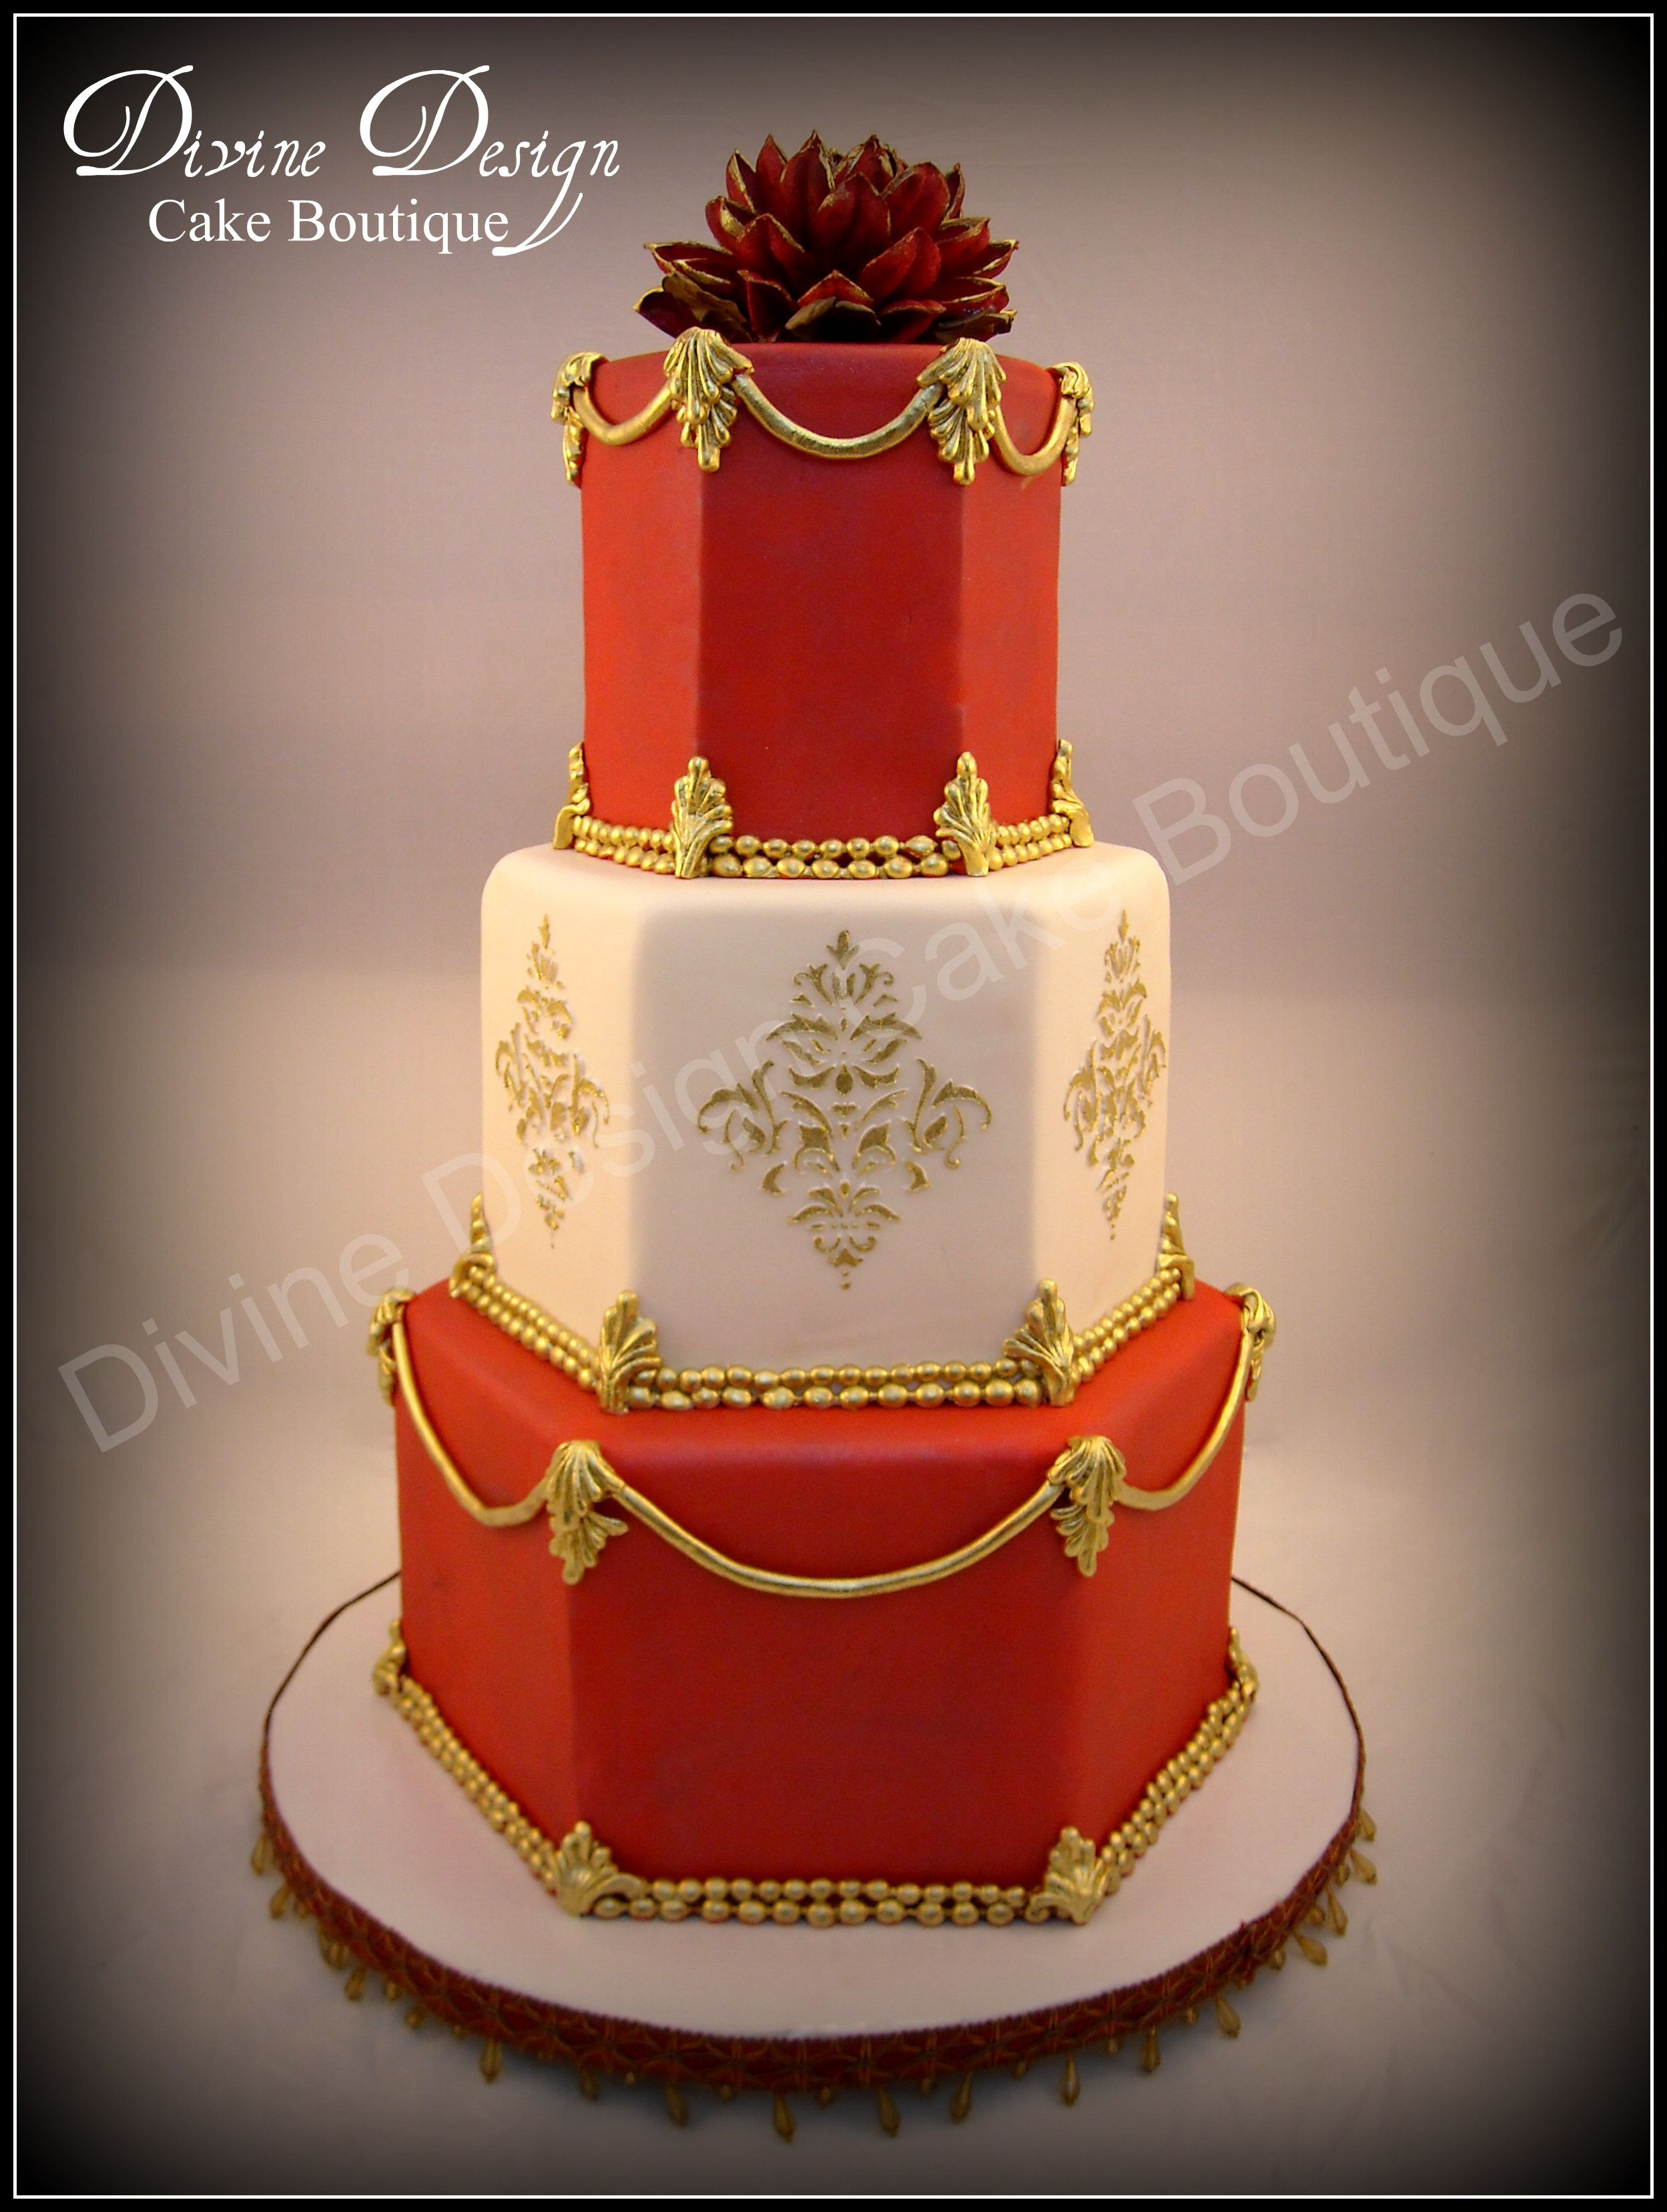 Hindu Inspired Wedding Cake Red and white fondant